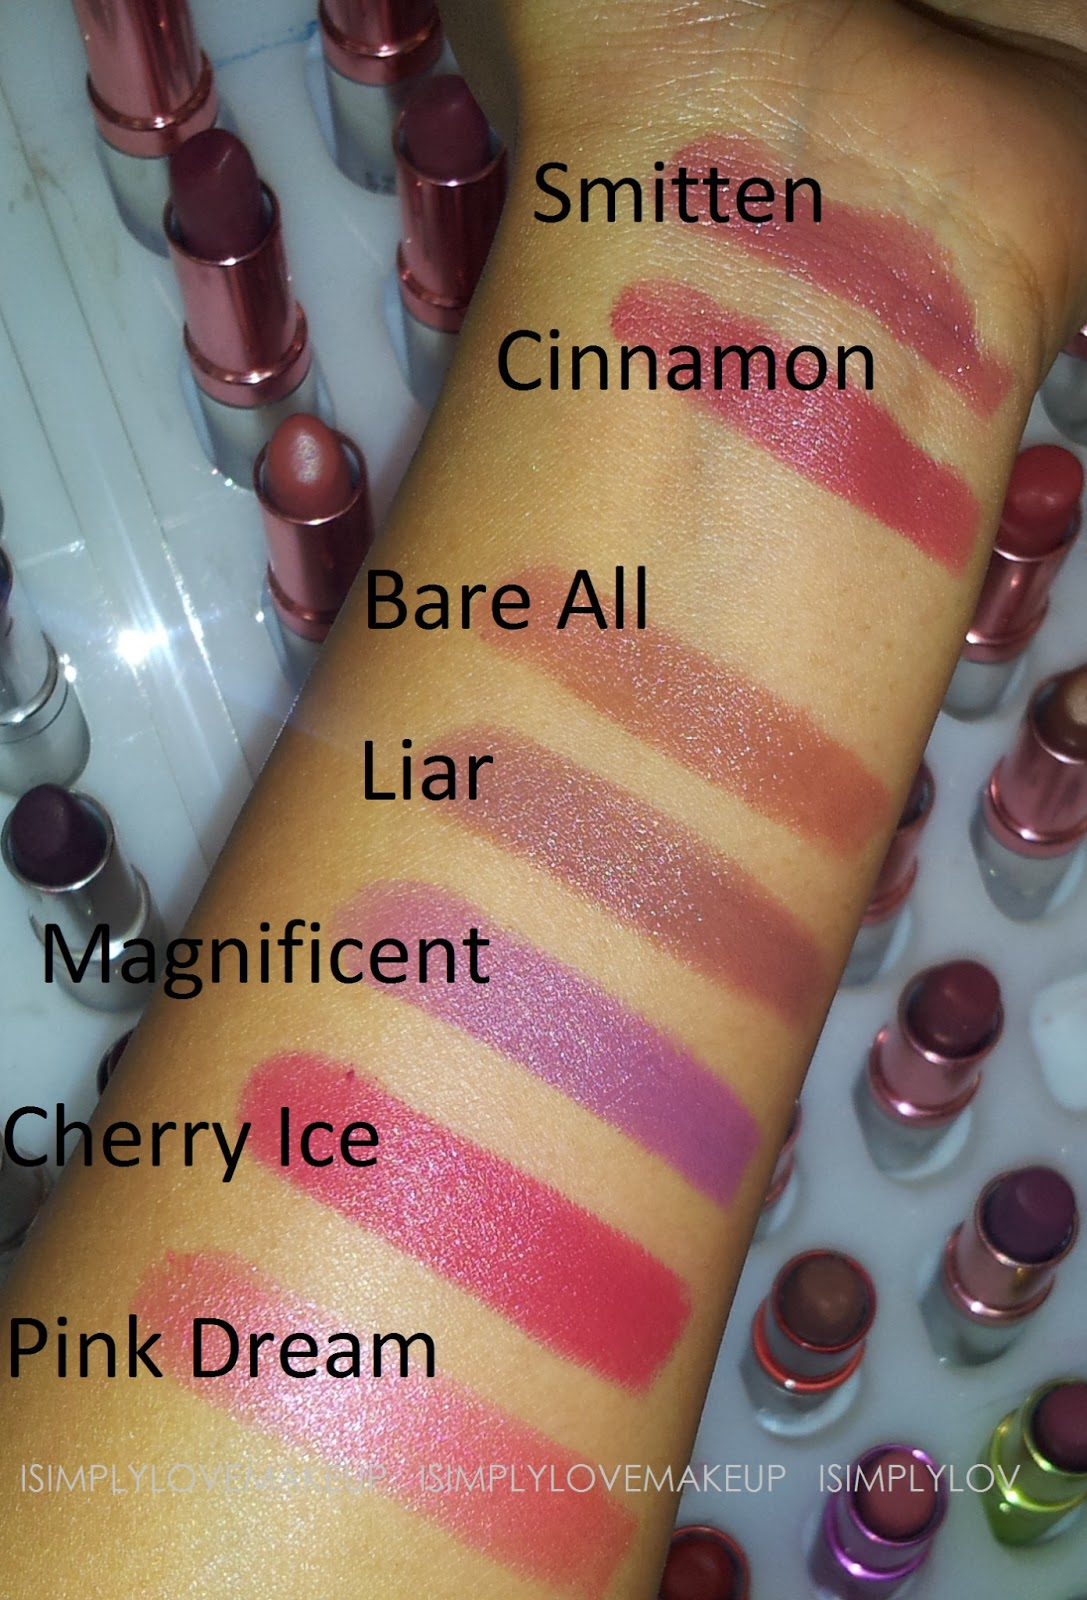 Swatch Fest: Colorbar Matte Touch Lipsticks